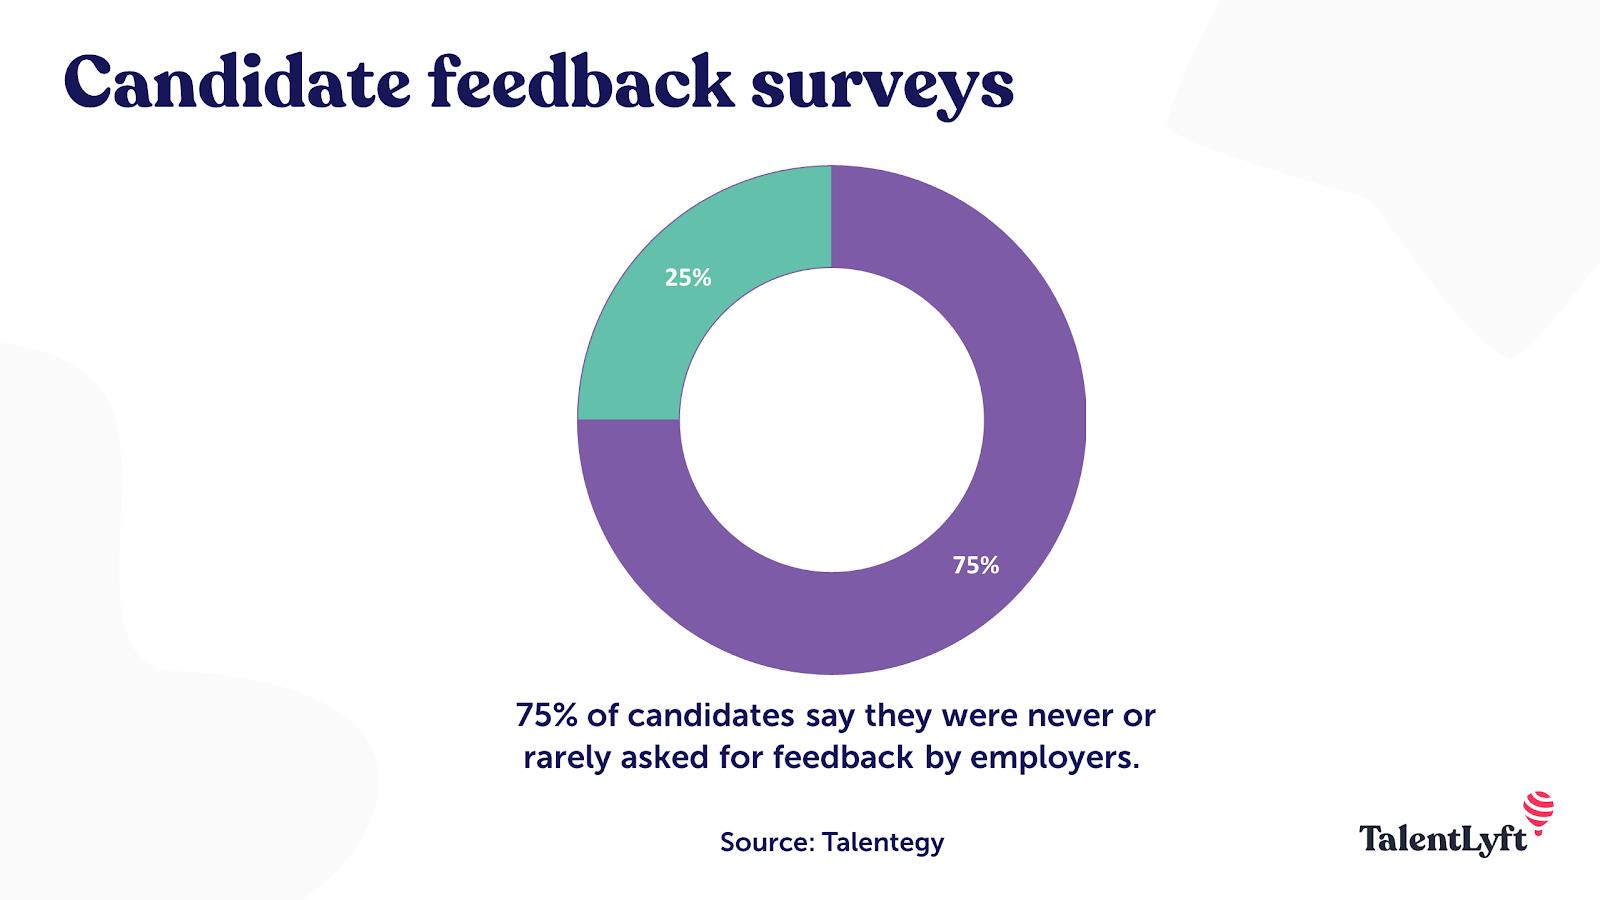 Candidate feedback survey statistic